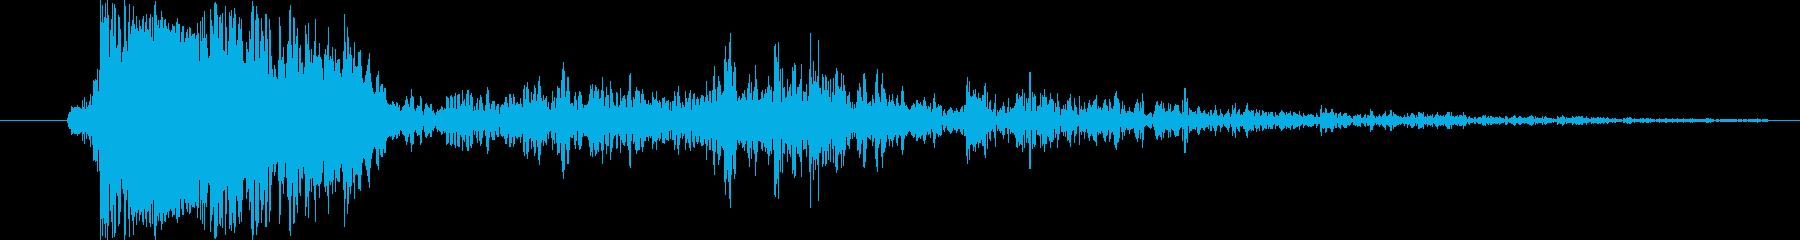 RPG ショットクローズ01の再生済みの波形